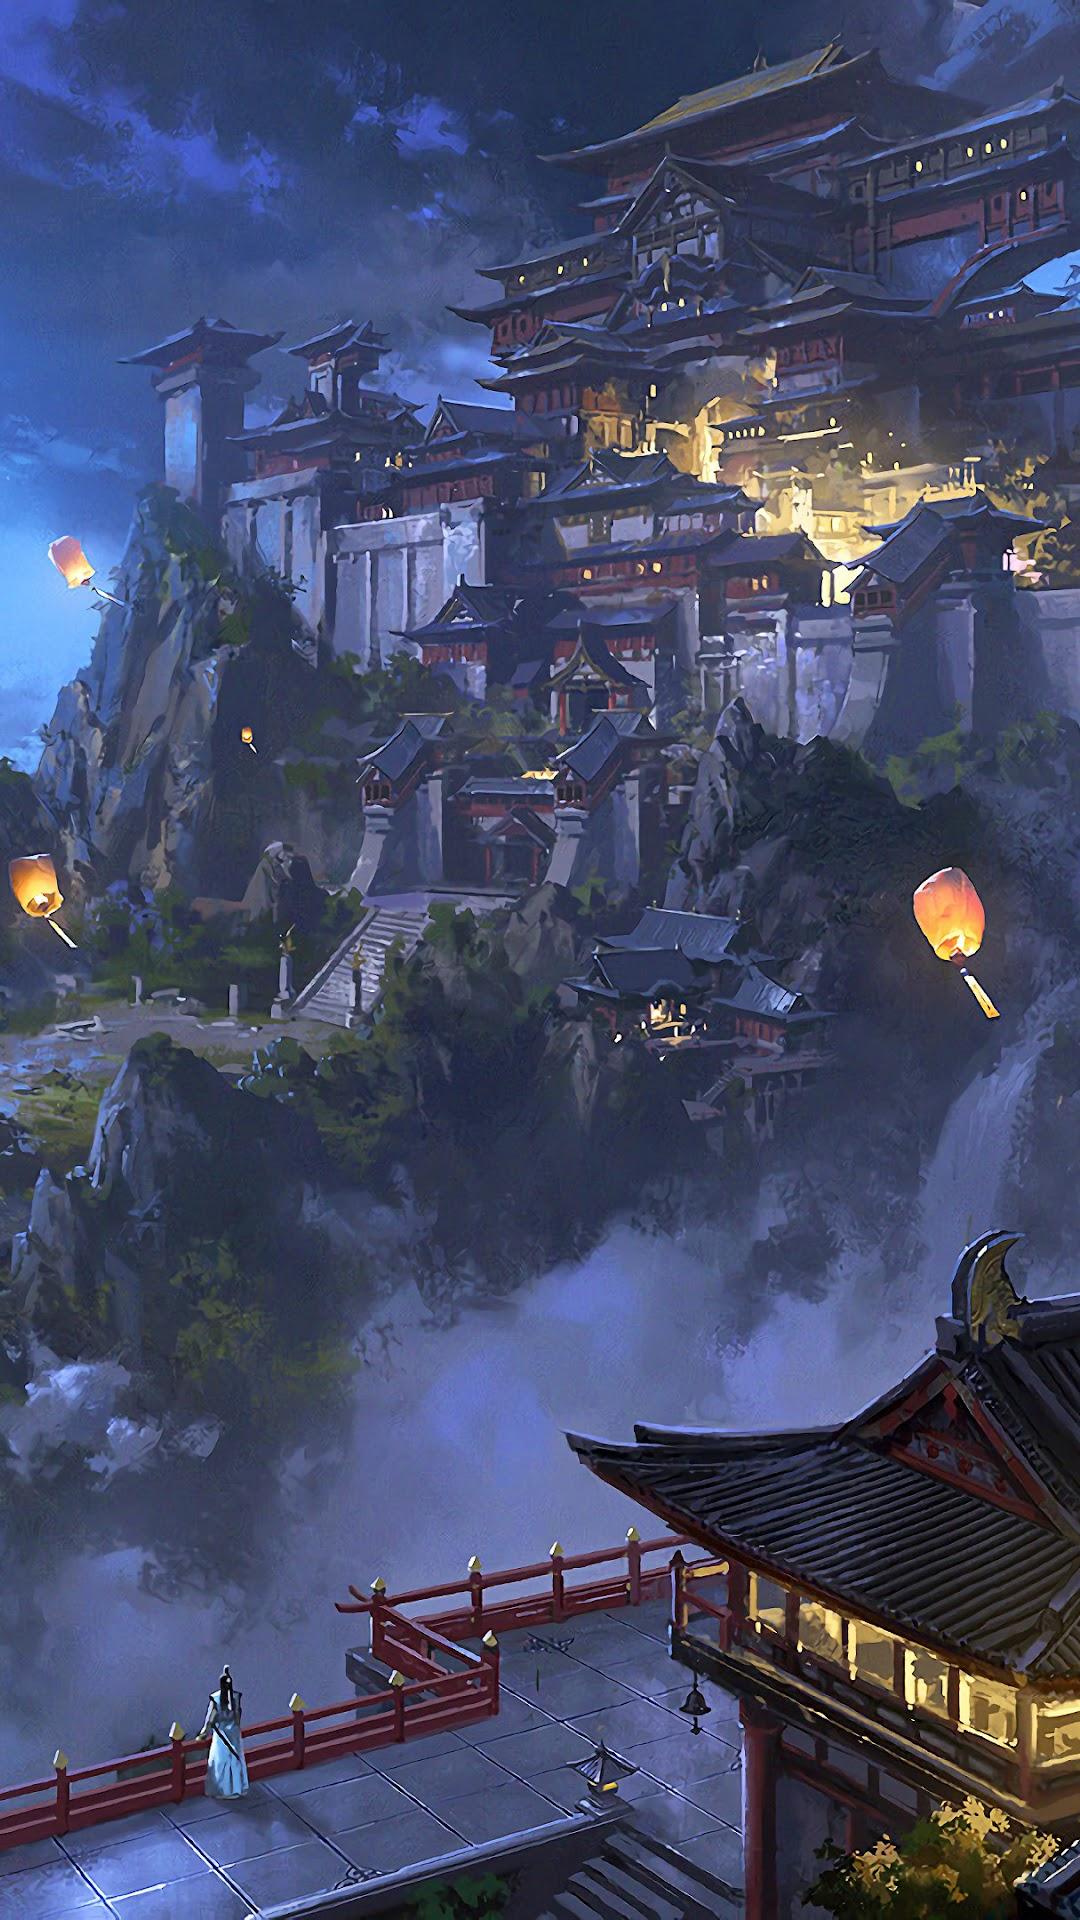 Anime Sky Lantern Mountain Japanese Castle Night Scenery 4k